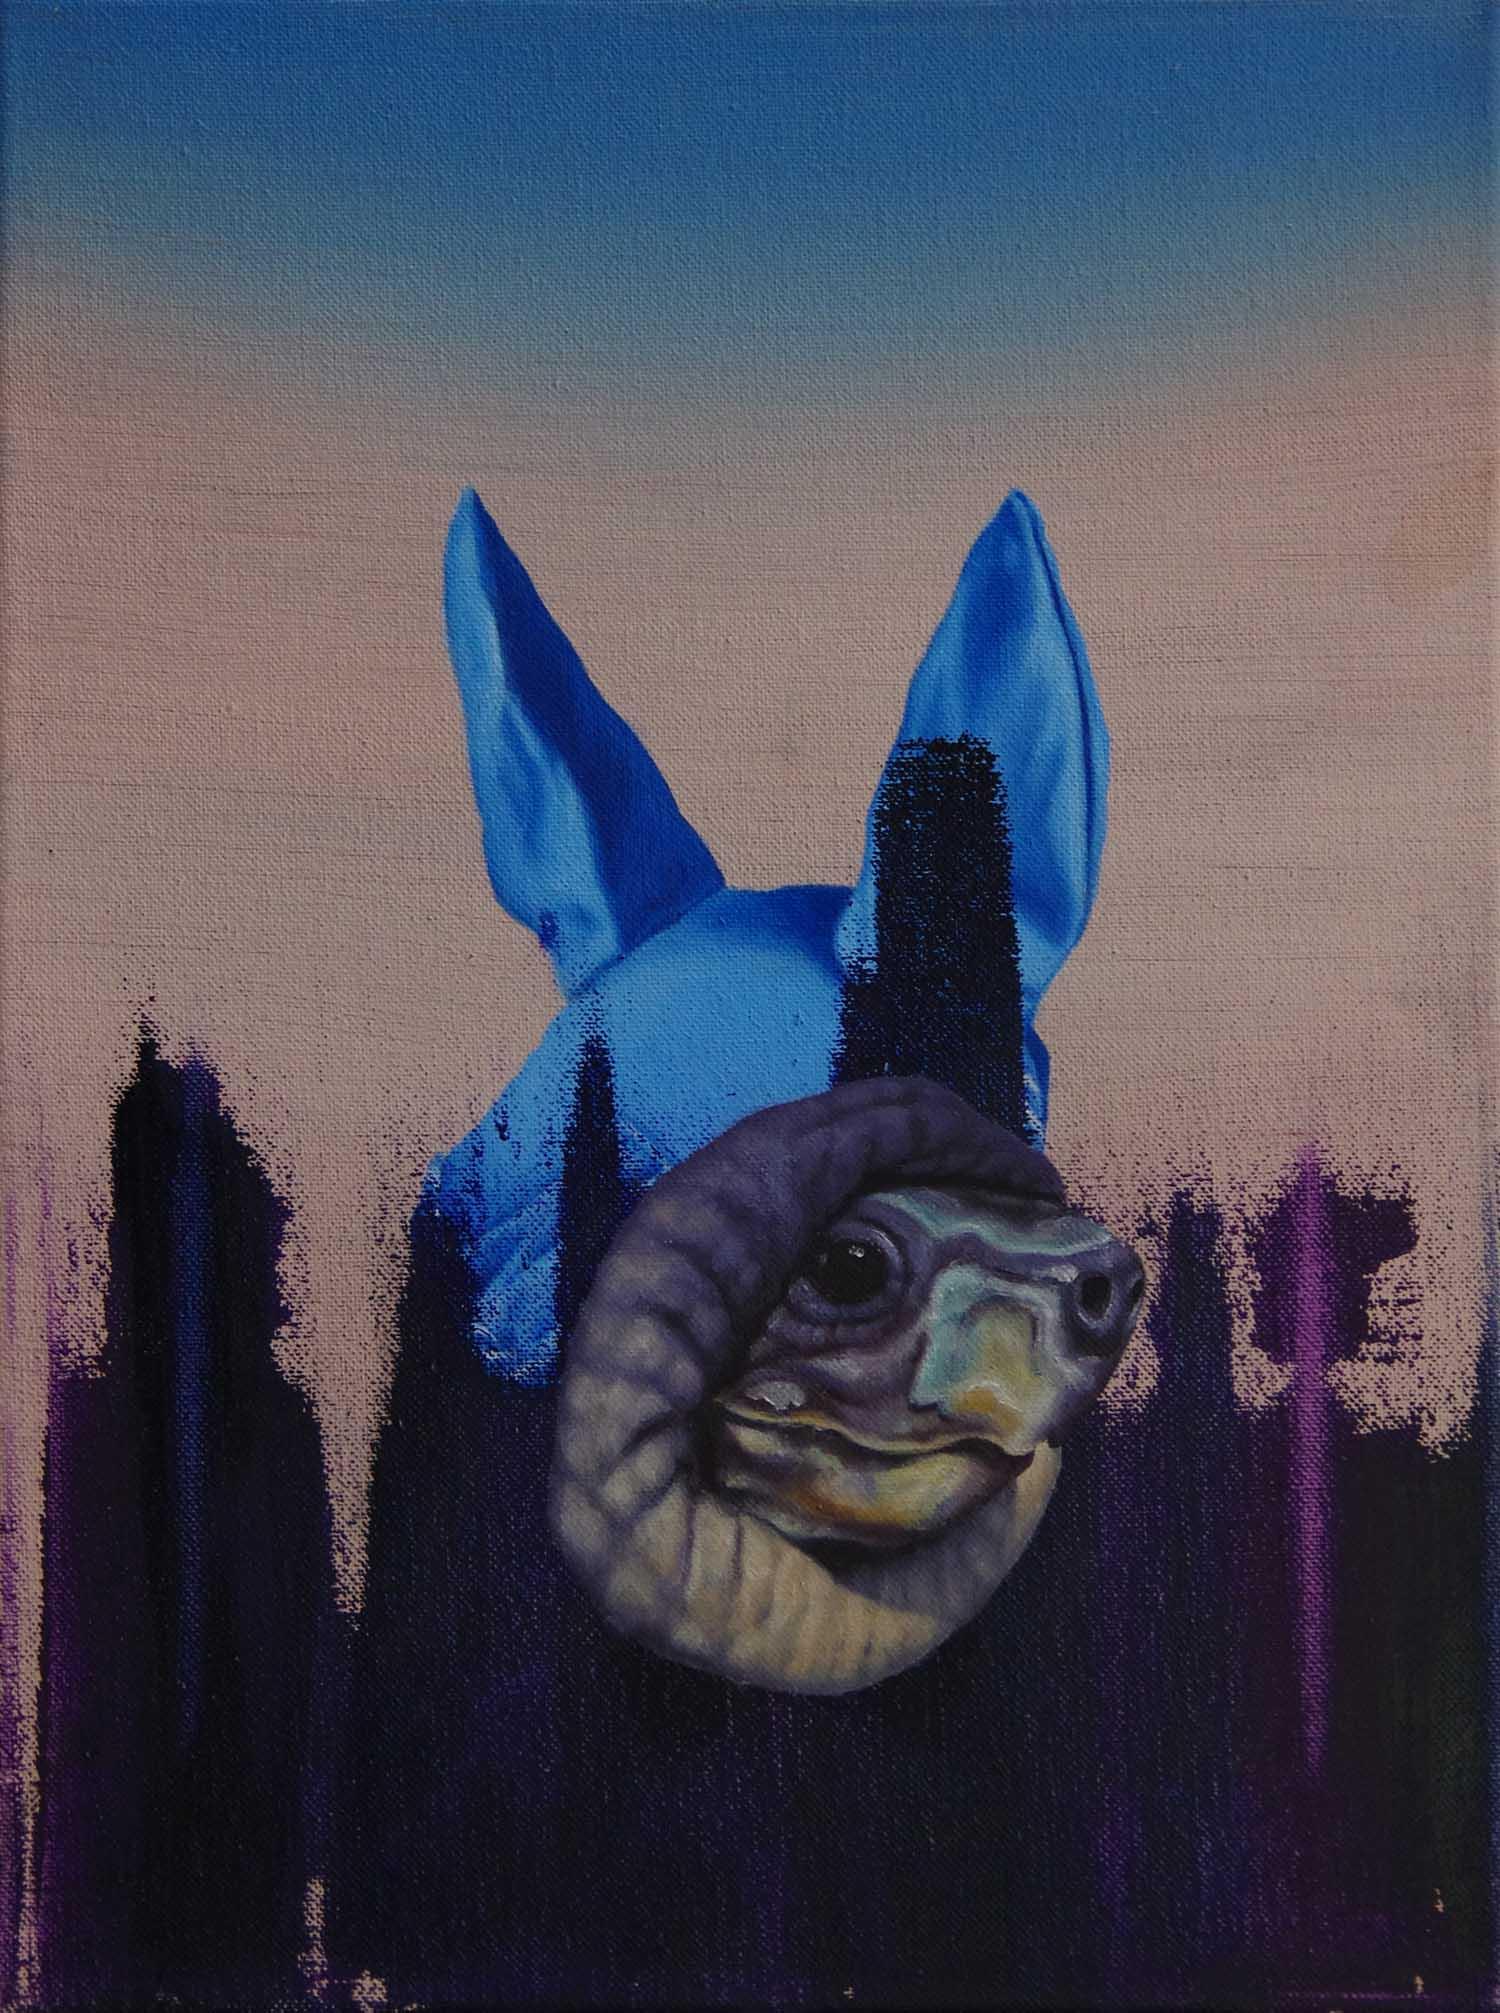 """al centro, al dentro"" 2011, 40 x 30 cm, Öl und Acryl auf Nessel"